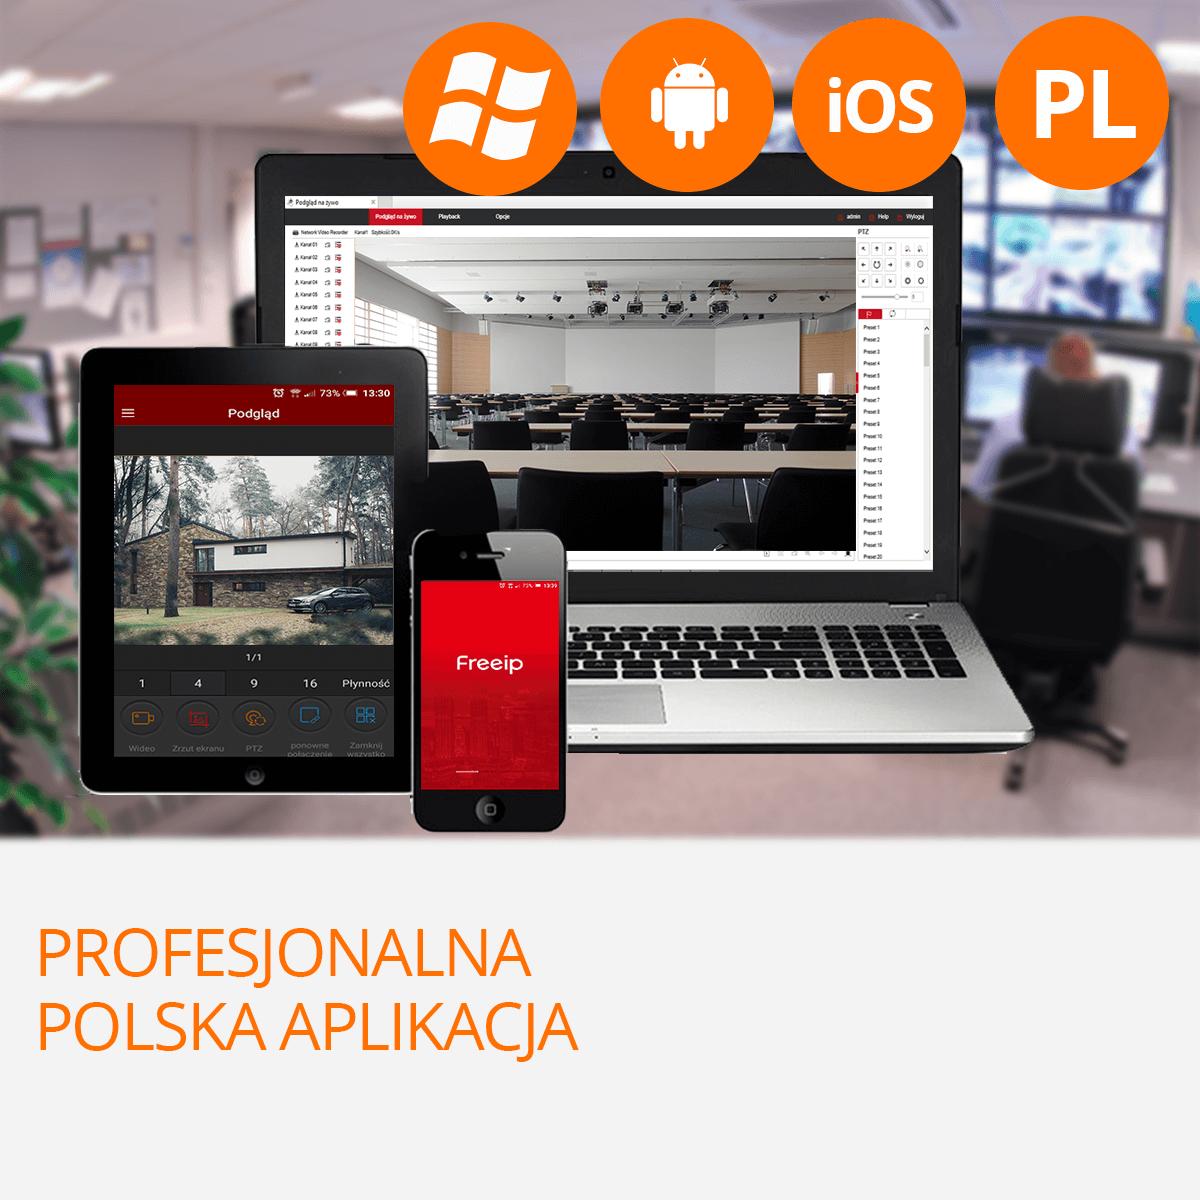 kamera polska darmowa aplikacja orllo.pl